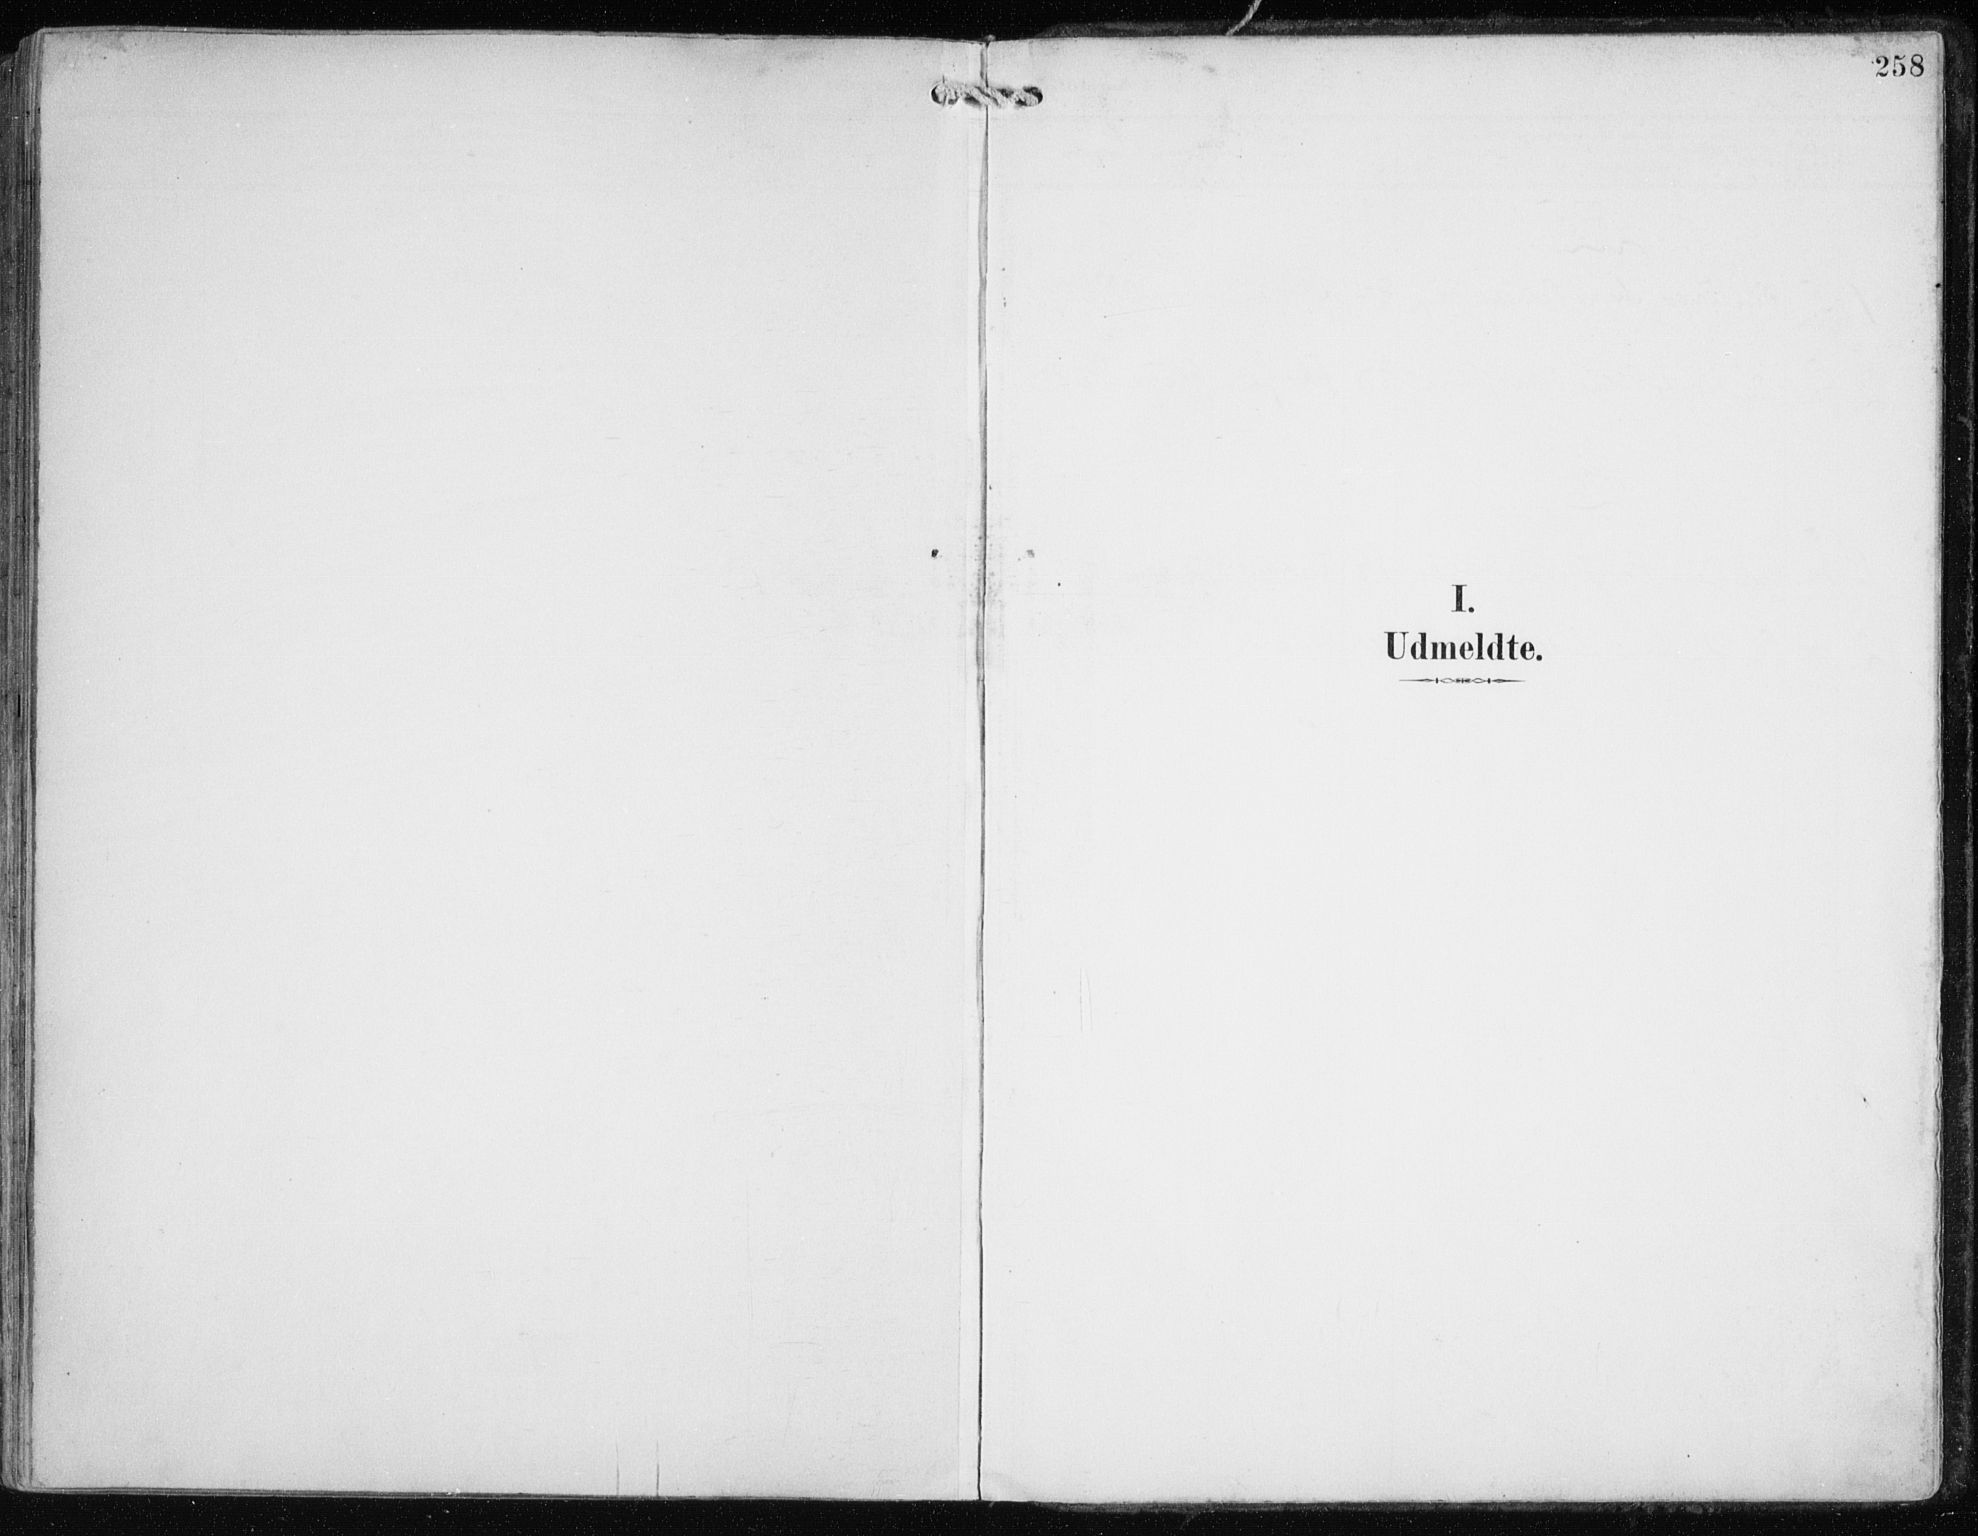 SATØ, Skjervøy sokneprestkontor, H/Ha/Haa/L0016kirke: Ministerialbok nr. 16, 1892-1908, s. 258